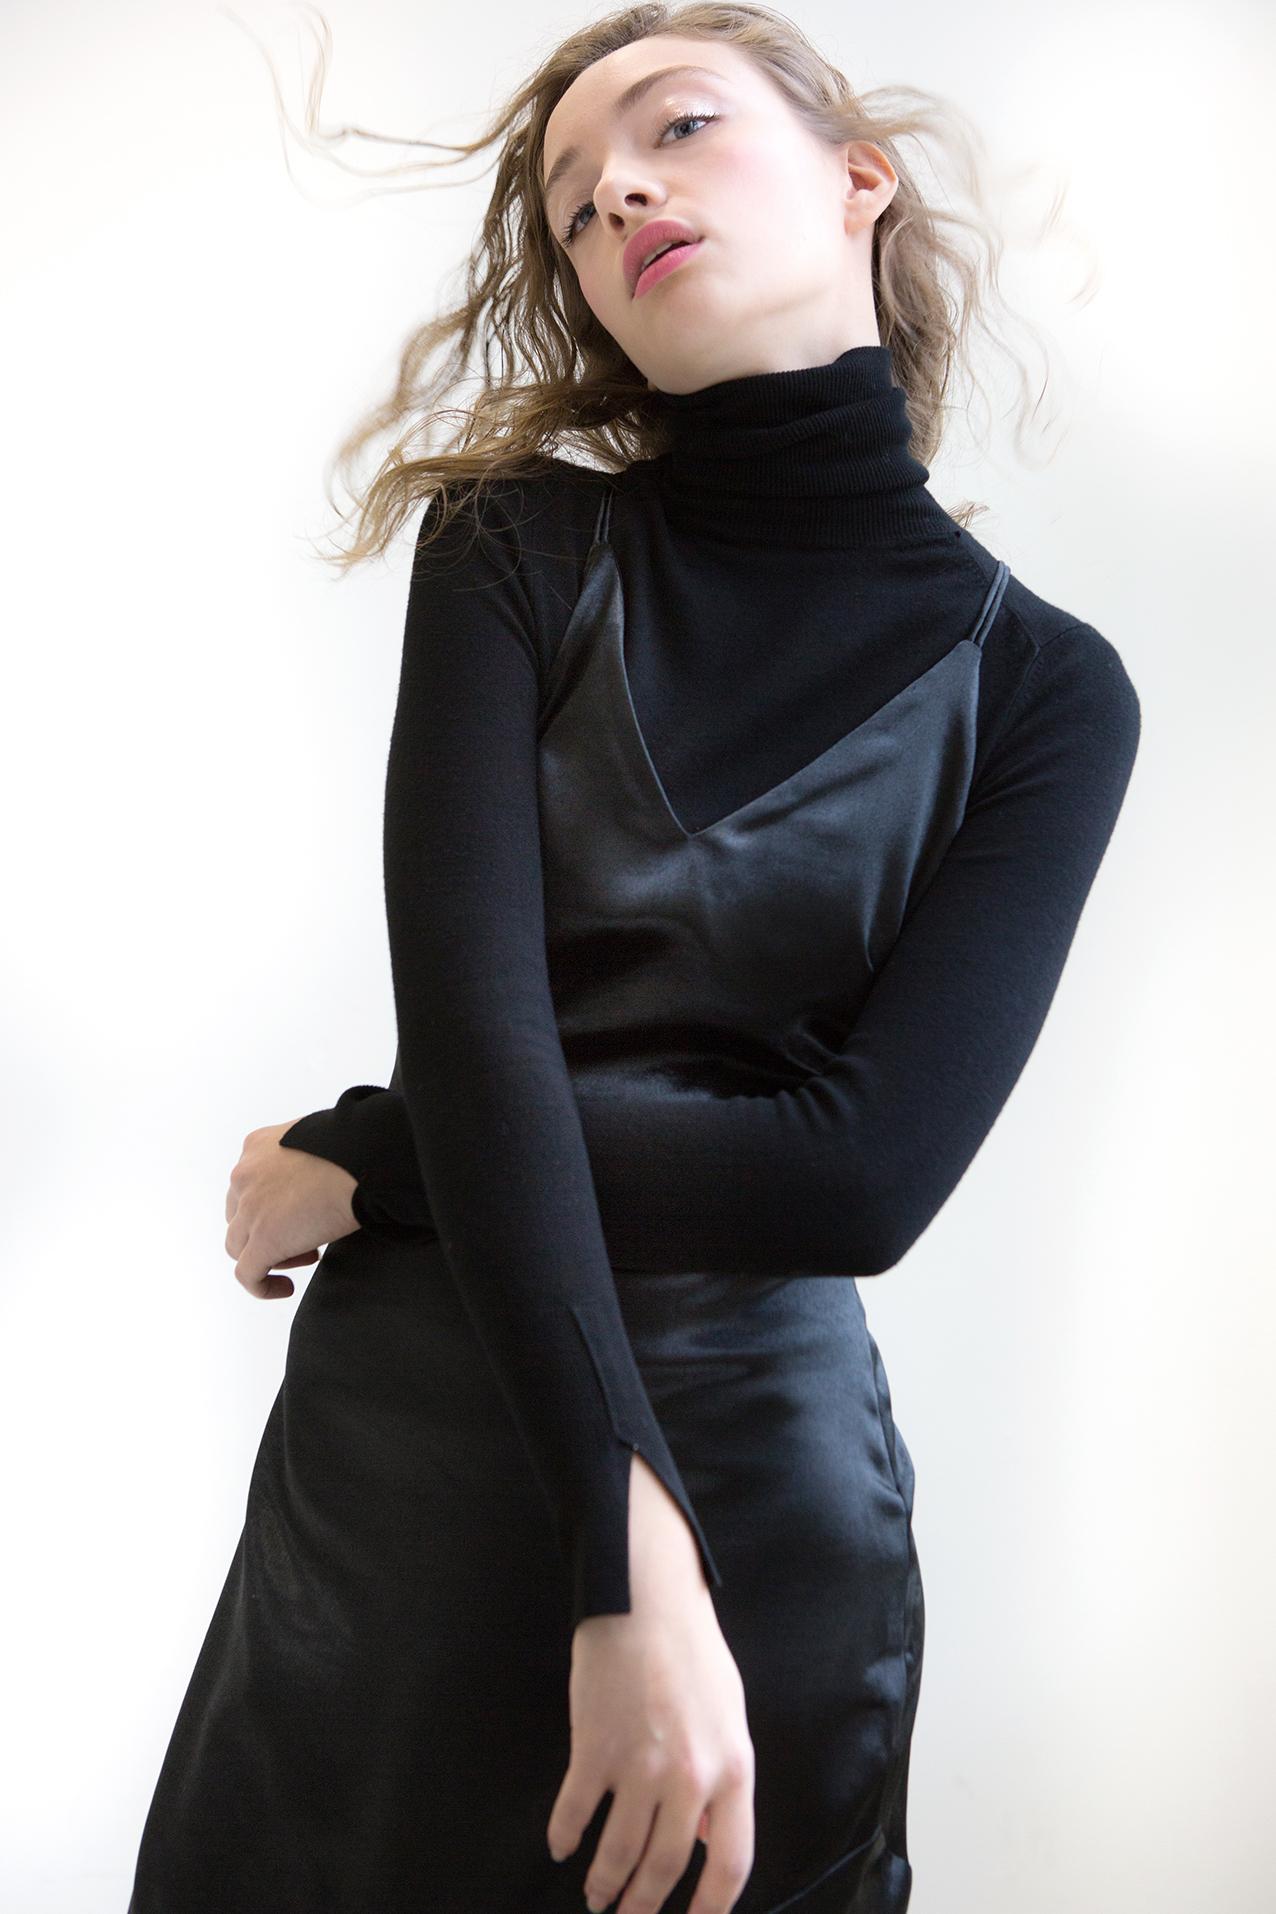 Black dress small 7H9A3080